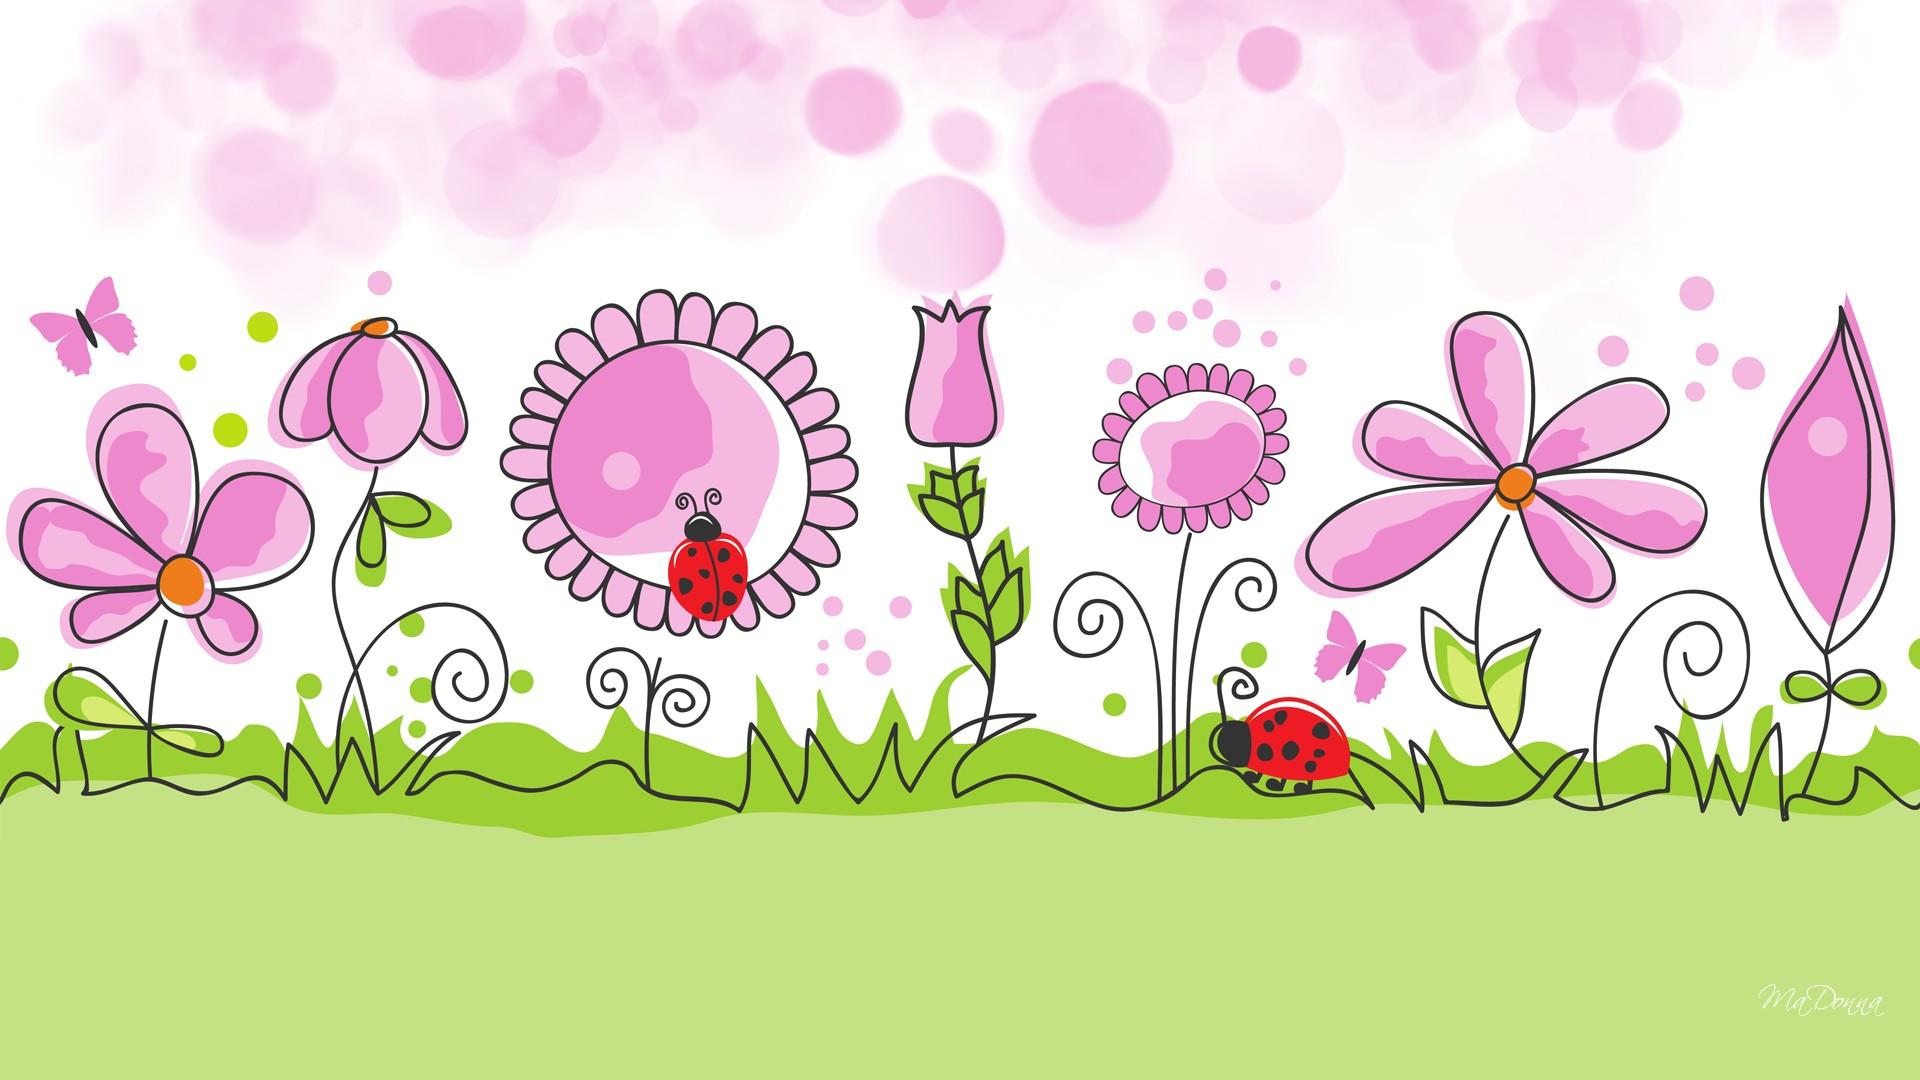 Flower Garden spring vector wallpaper 1920x1080 176832 1920x1080